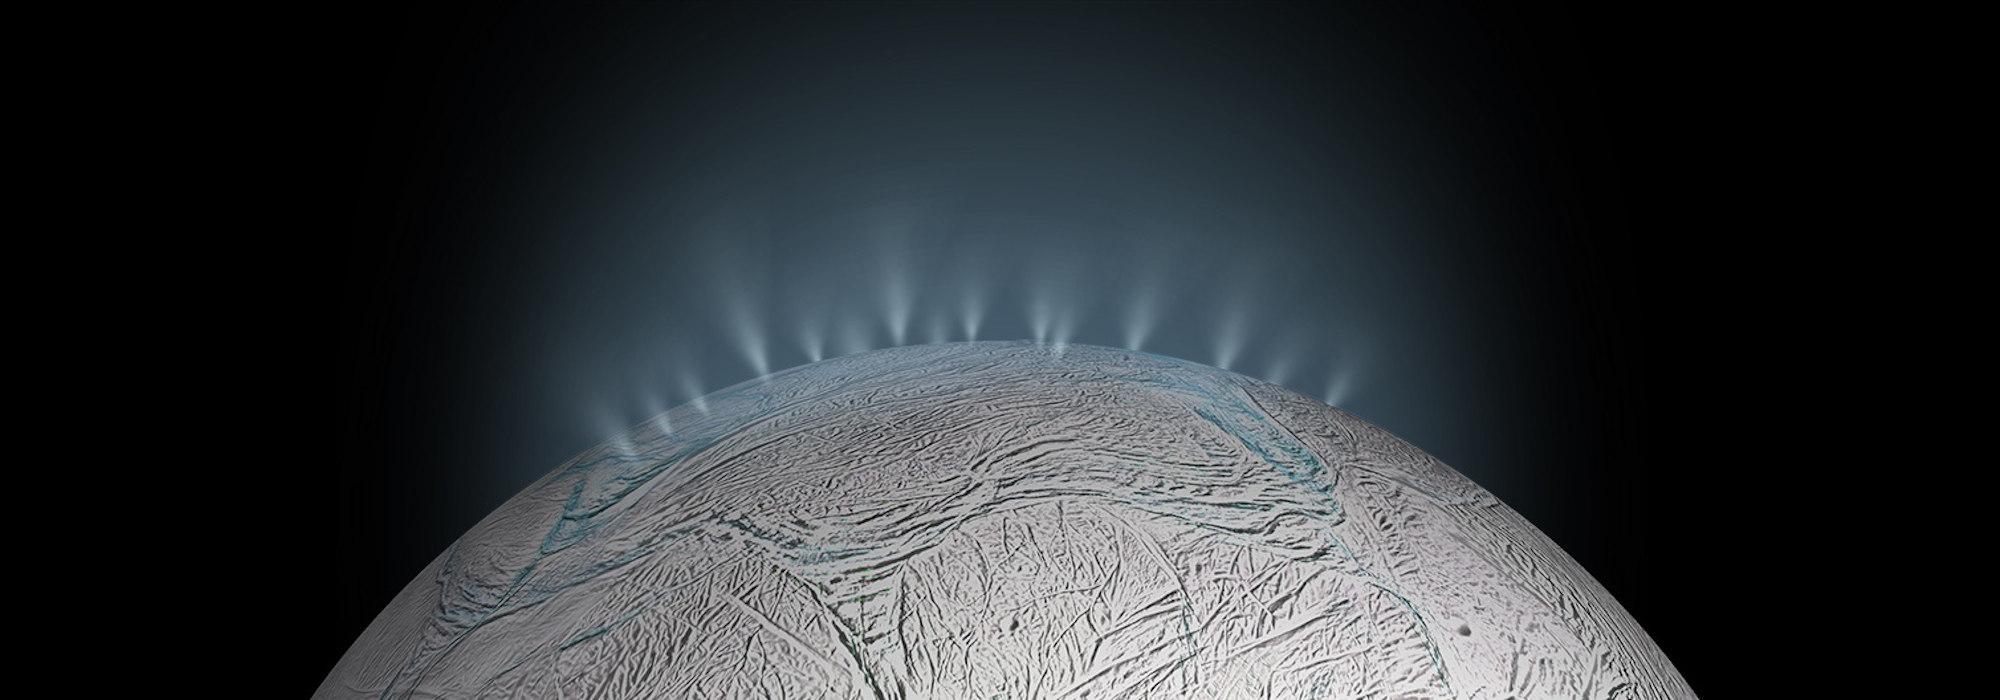 Muhabbet Teorisi | Enceladus'da Hidrotermal Bacalar